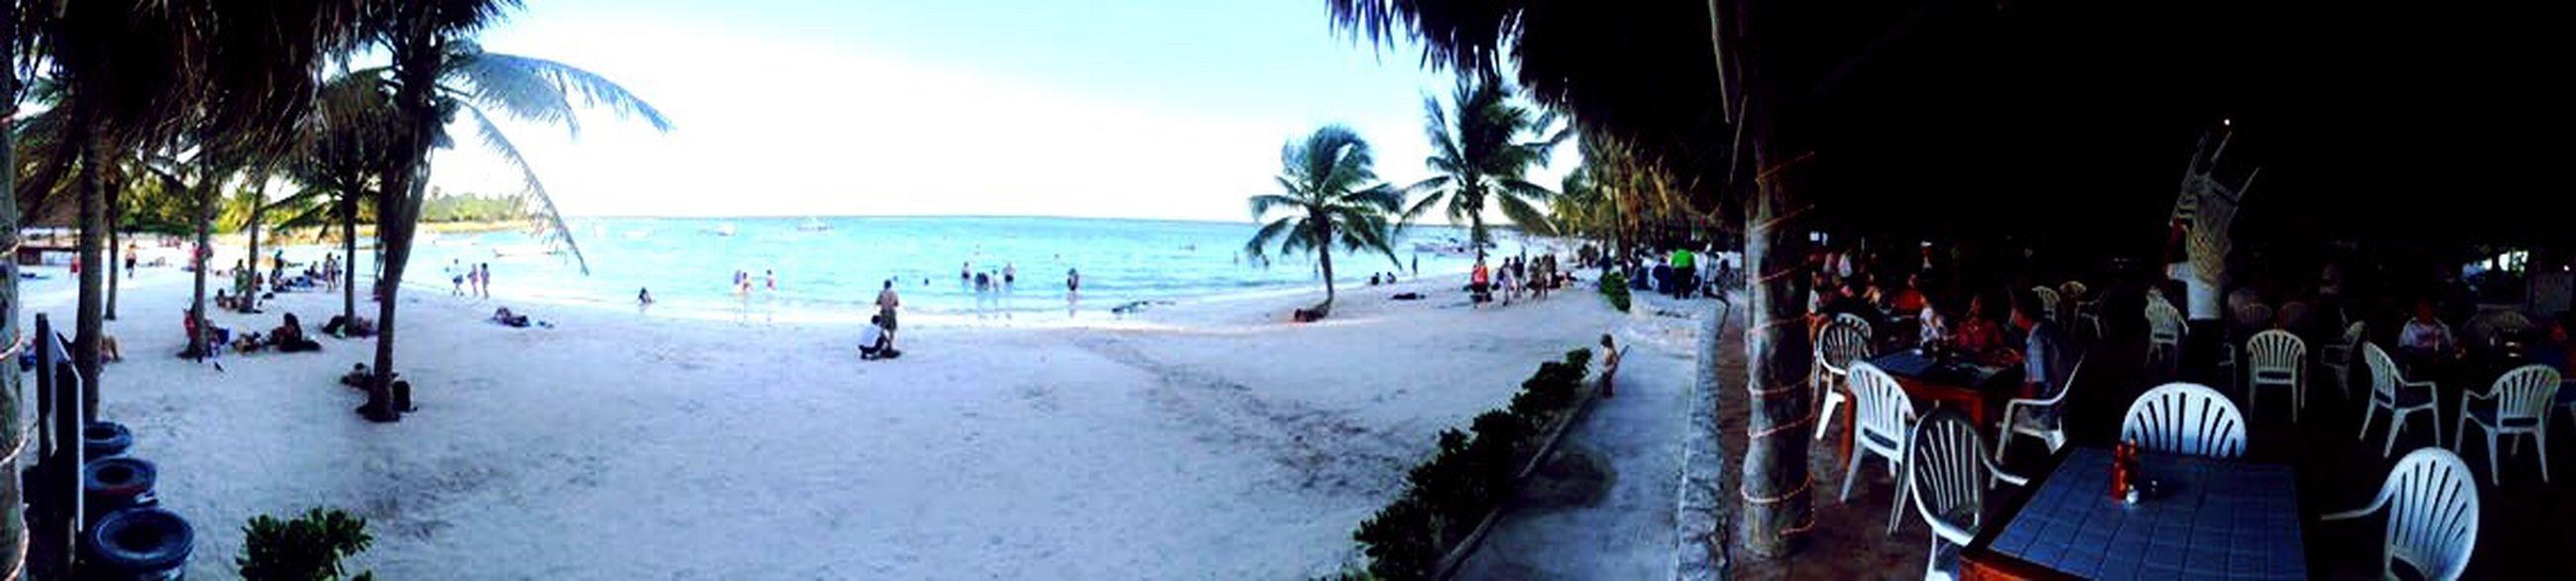 Akumal Mexico Relaxing